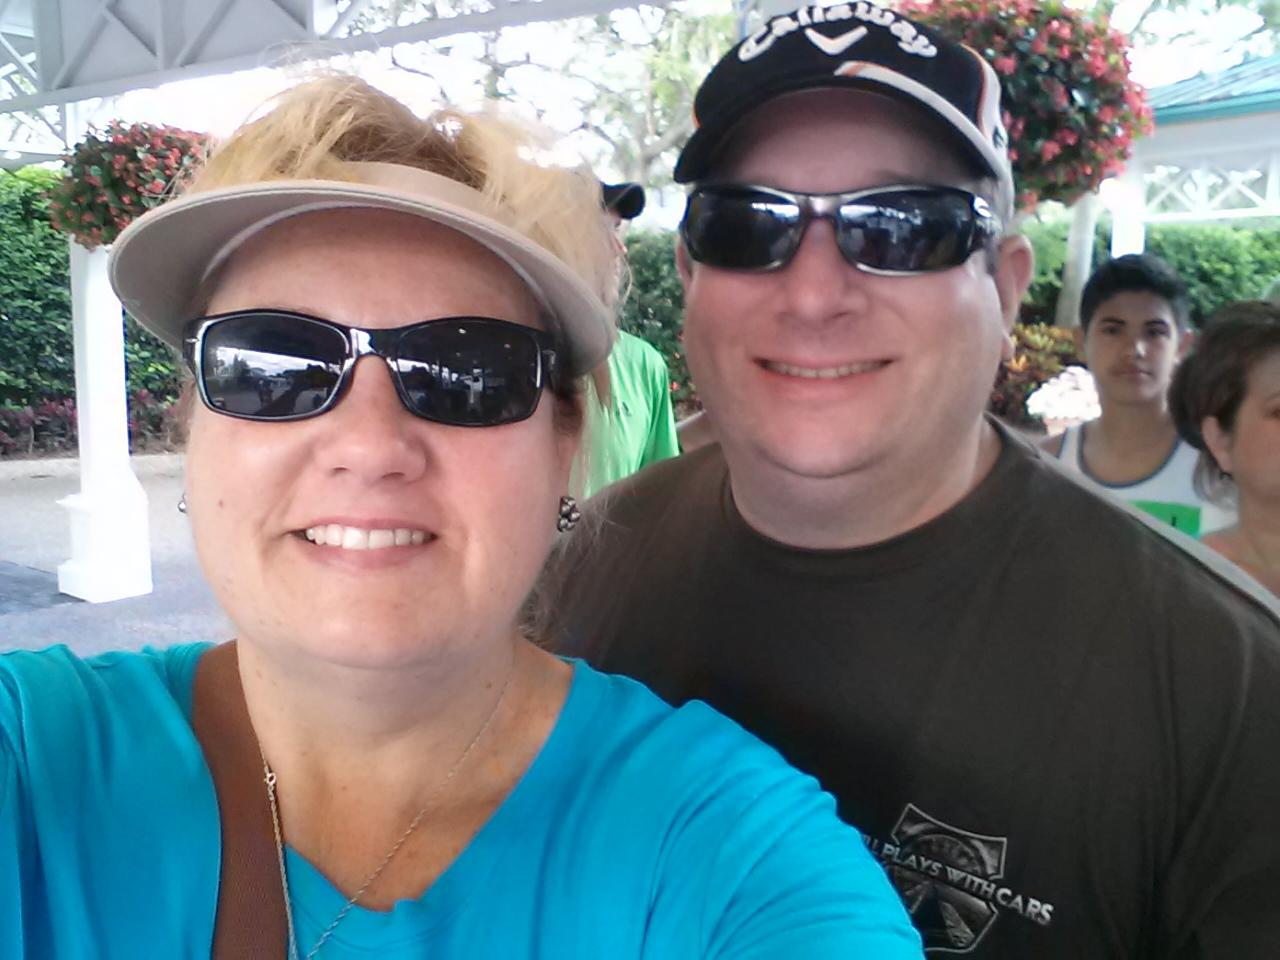 Sea World Orlando gives teachers free admission with their Teacher Study Pass program.